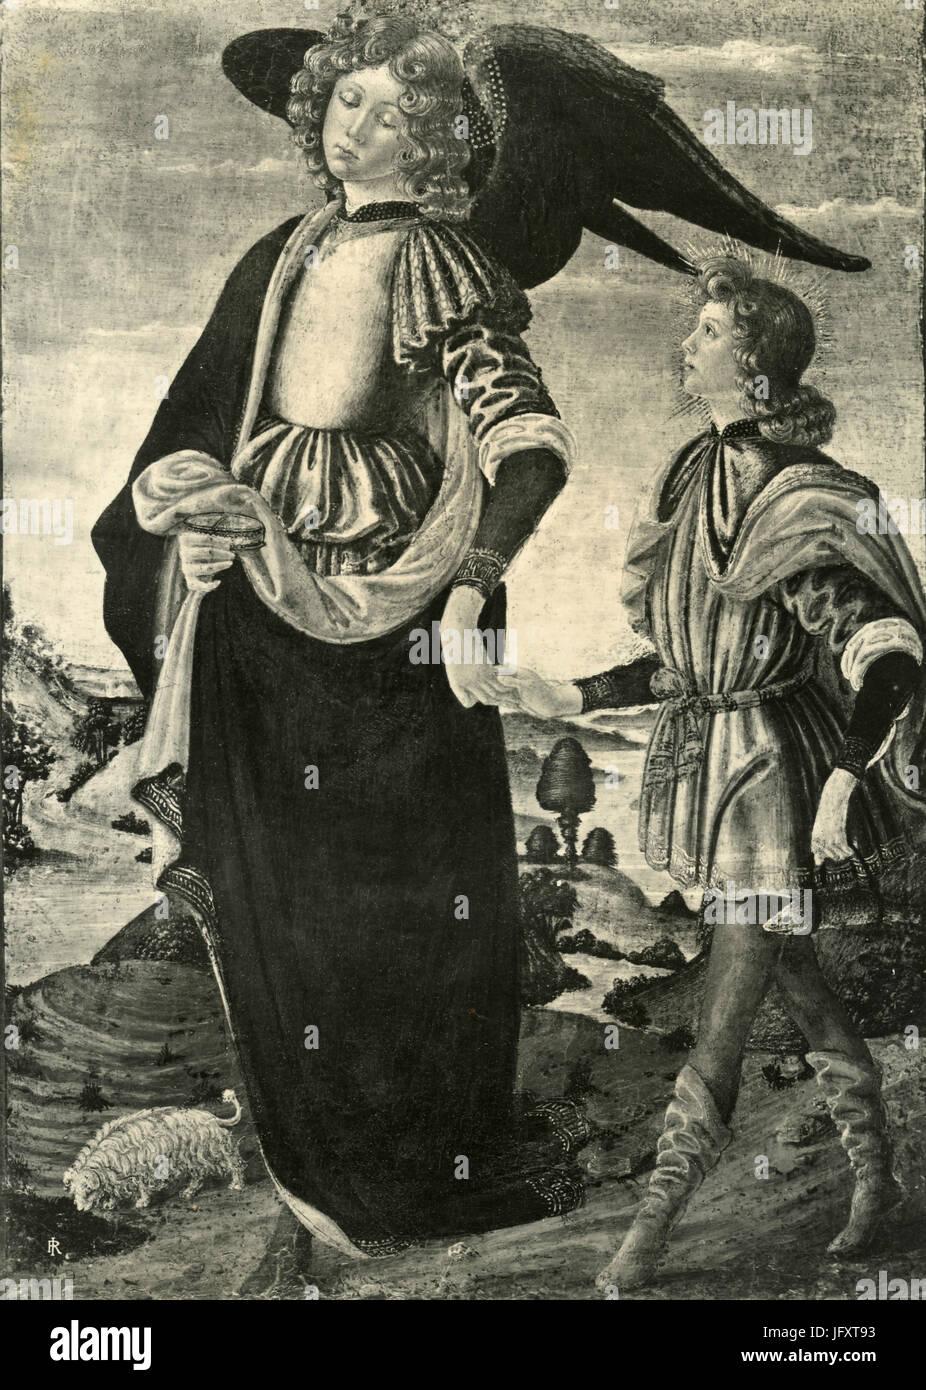 Archangel with Tobiolo, painting by scuola fiorentina XV sec., Bergamo, Italy - Stock Image